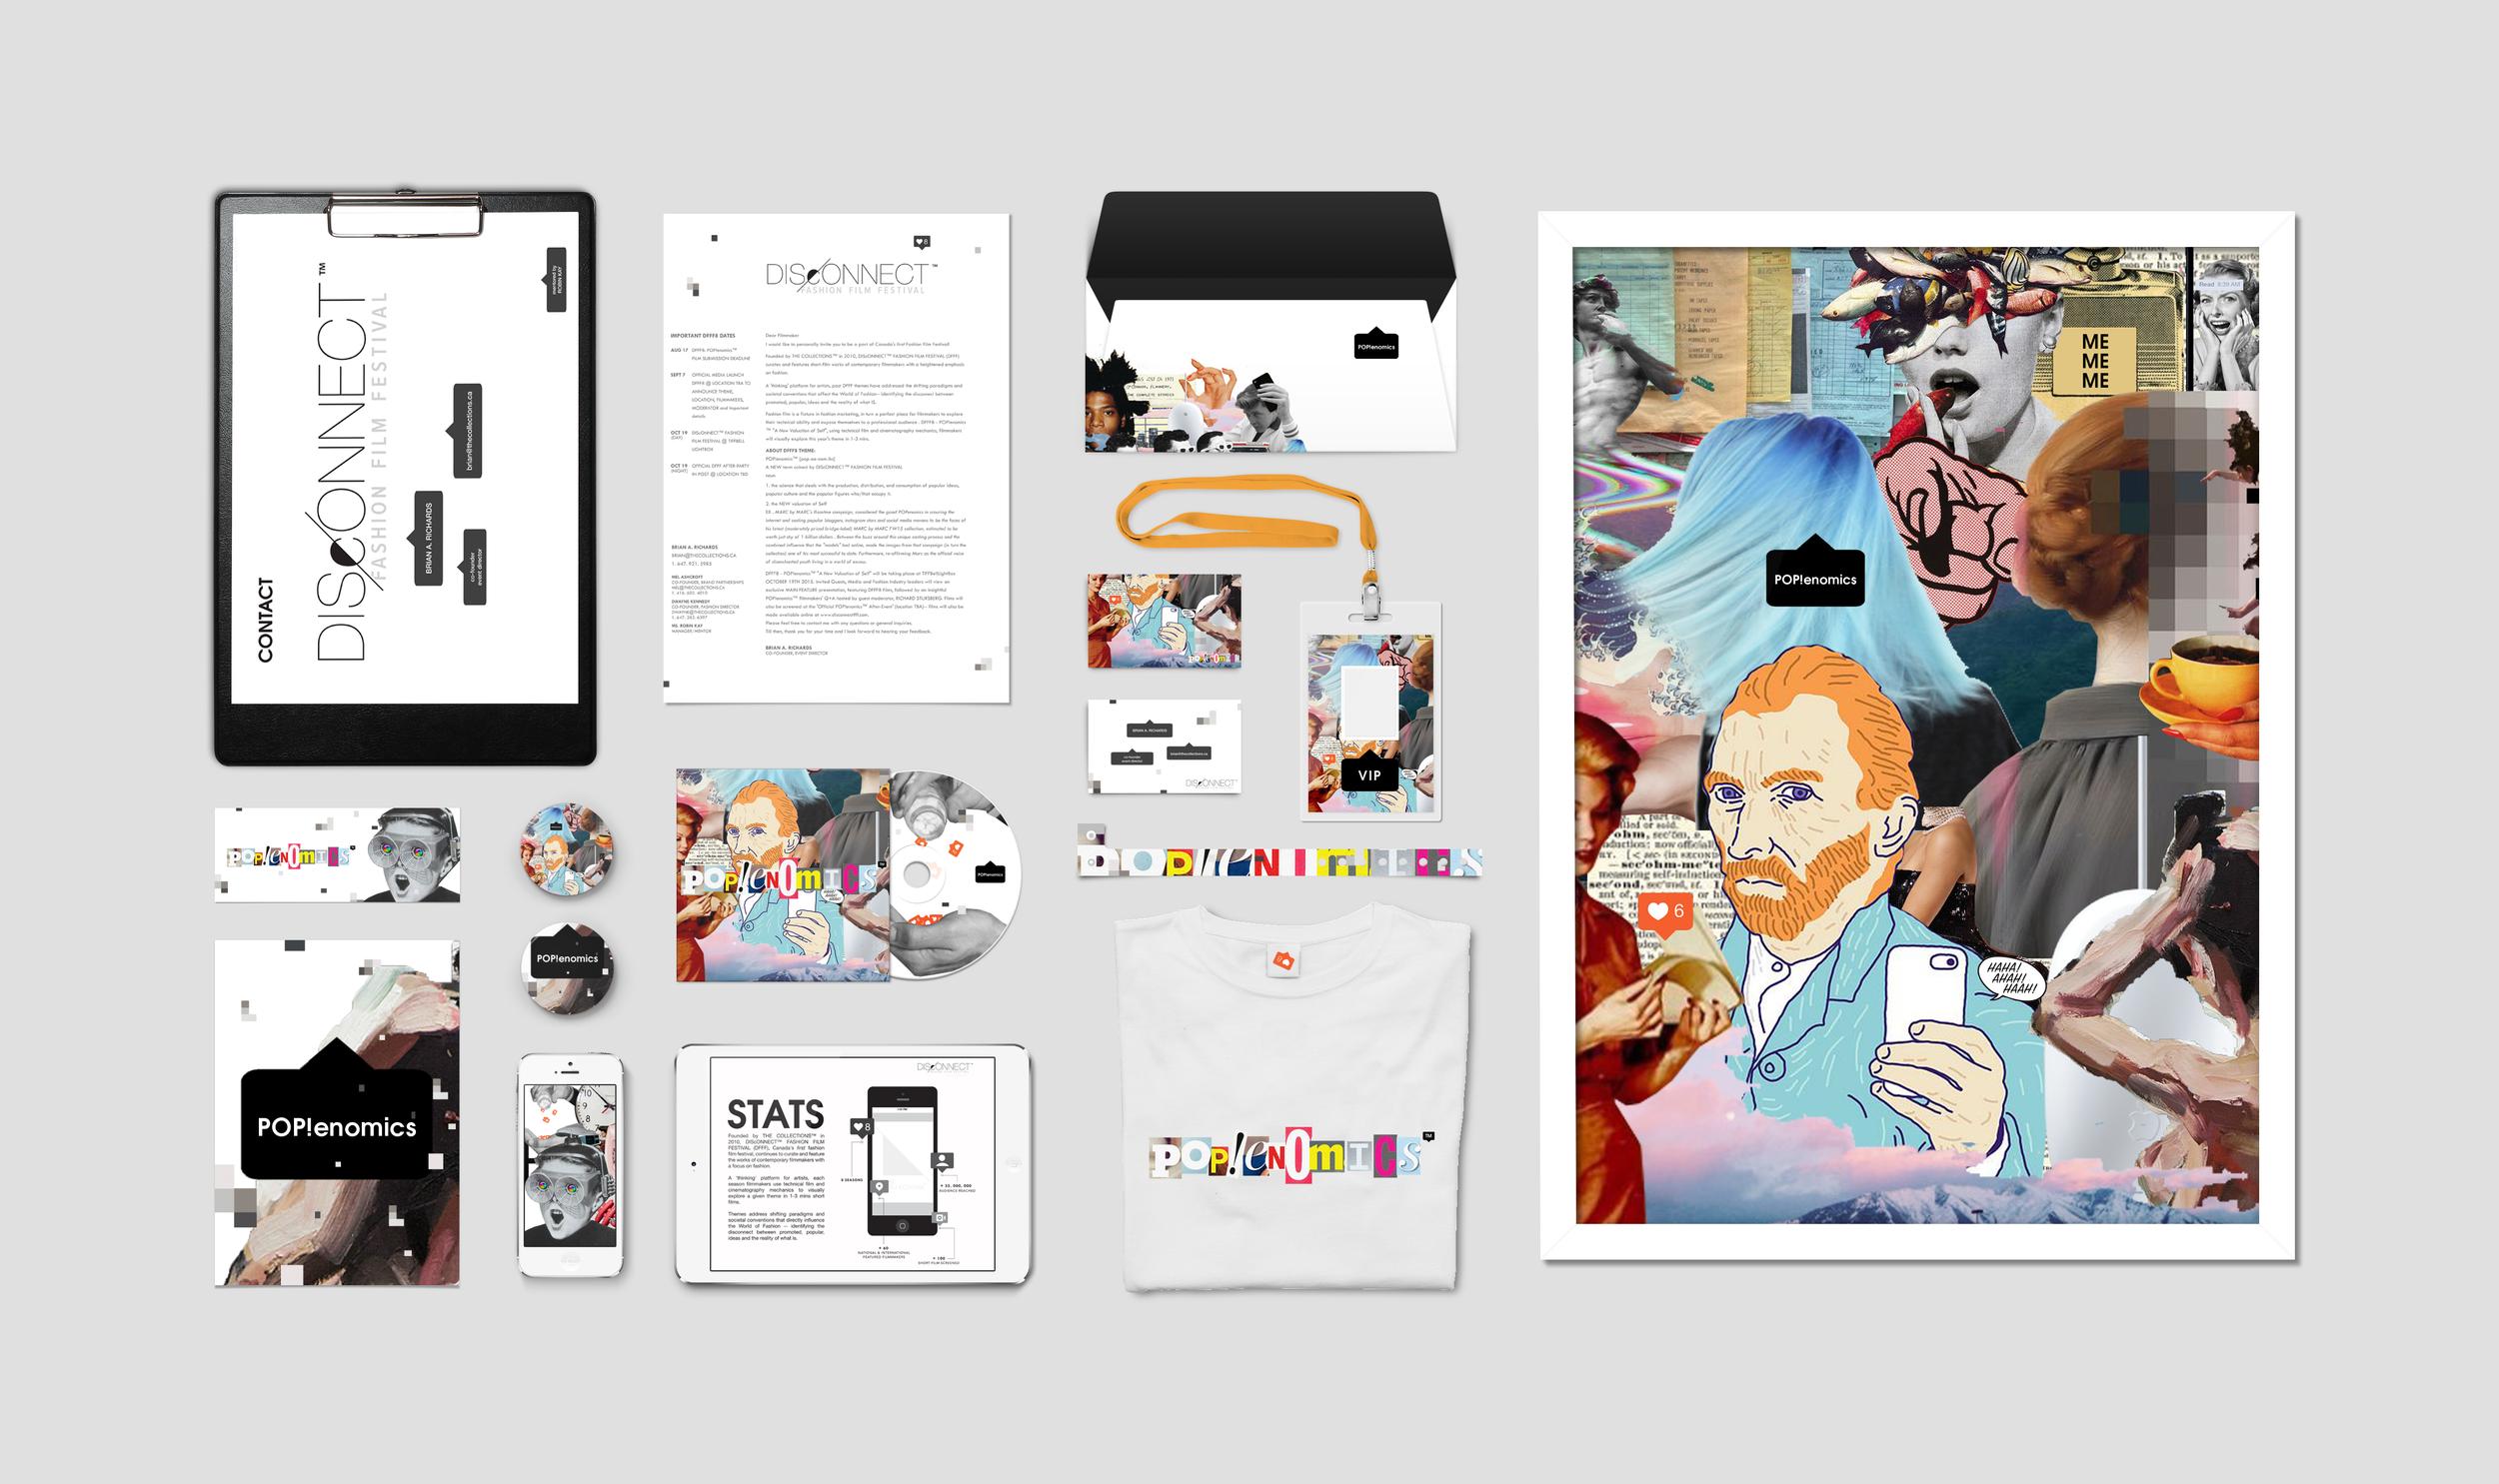 POP!enomics-Branding Identity.png